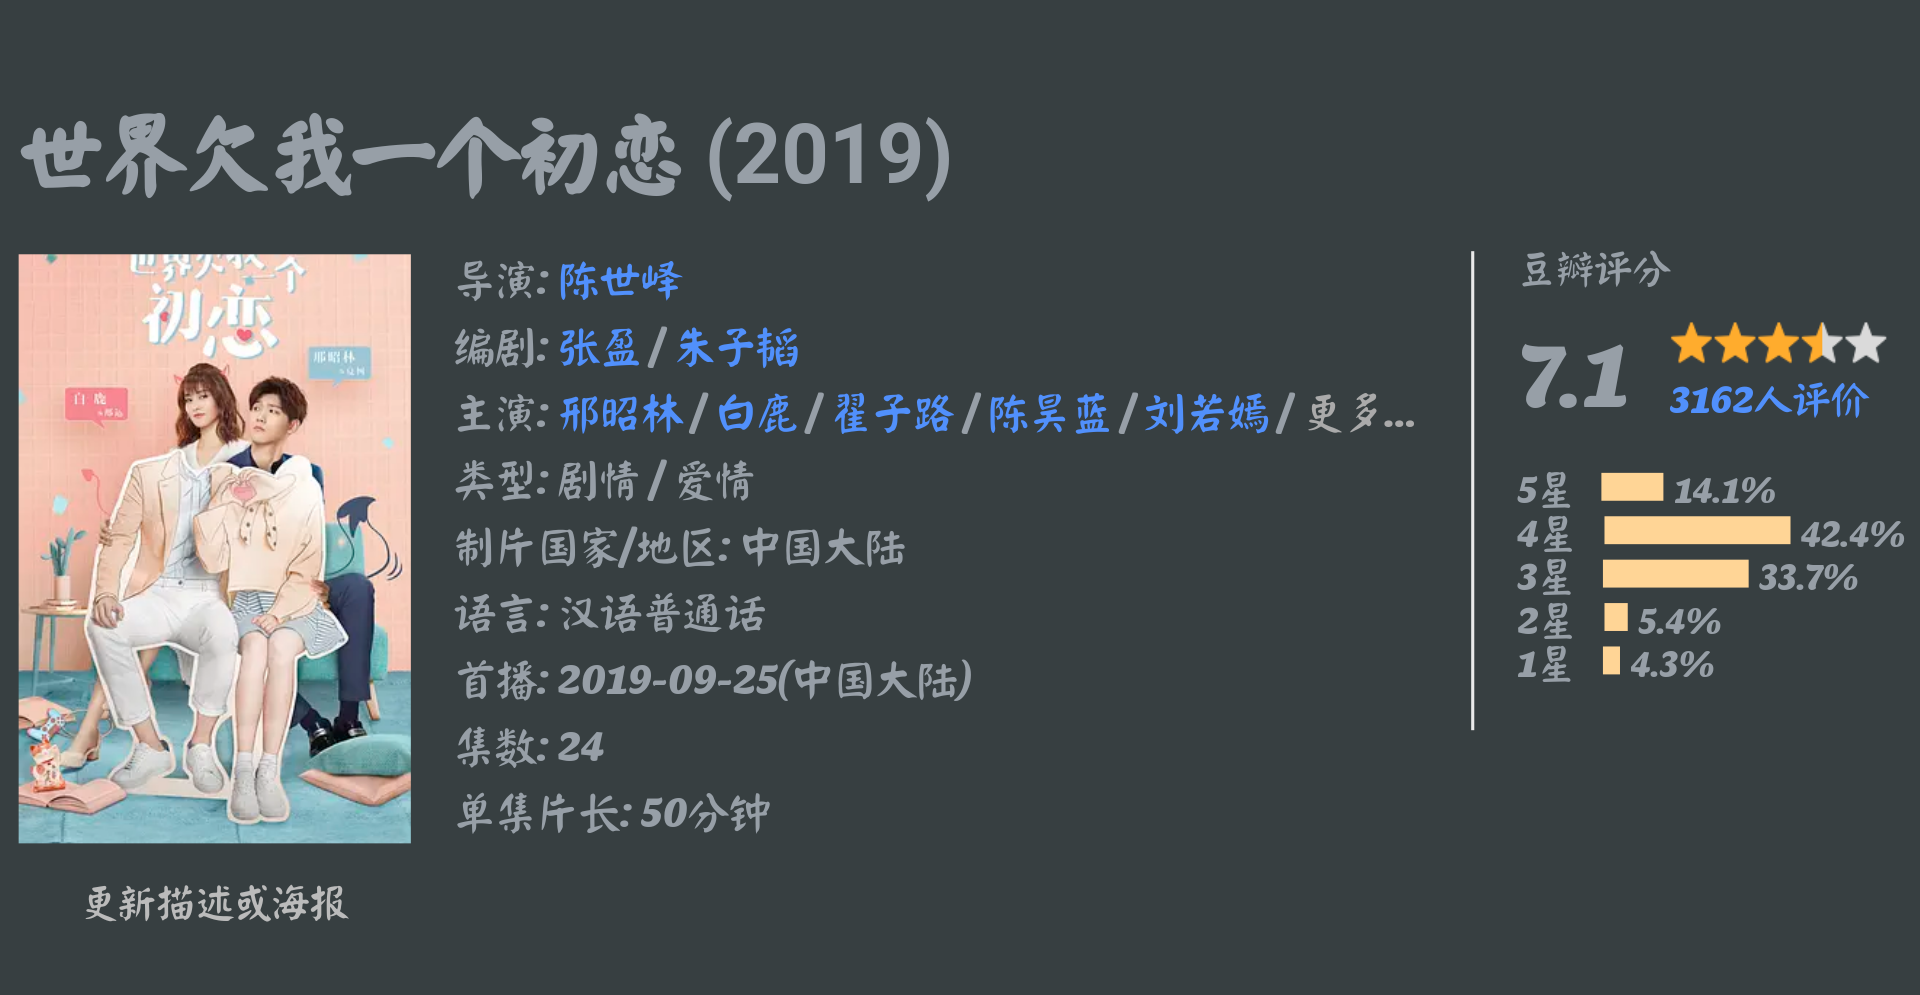 Screenshot_2019-10-03-22-12-33.png